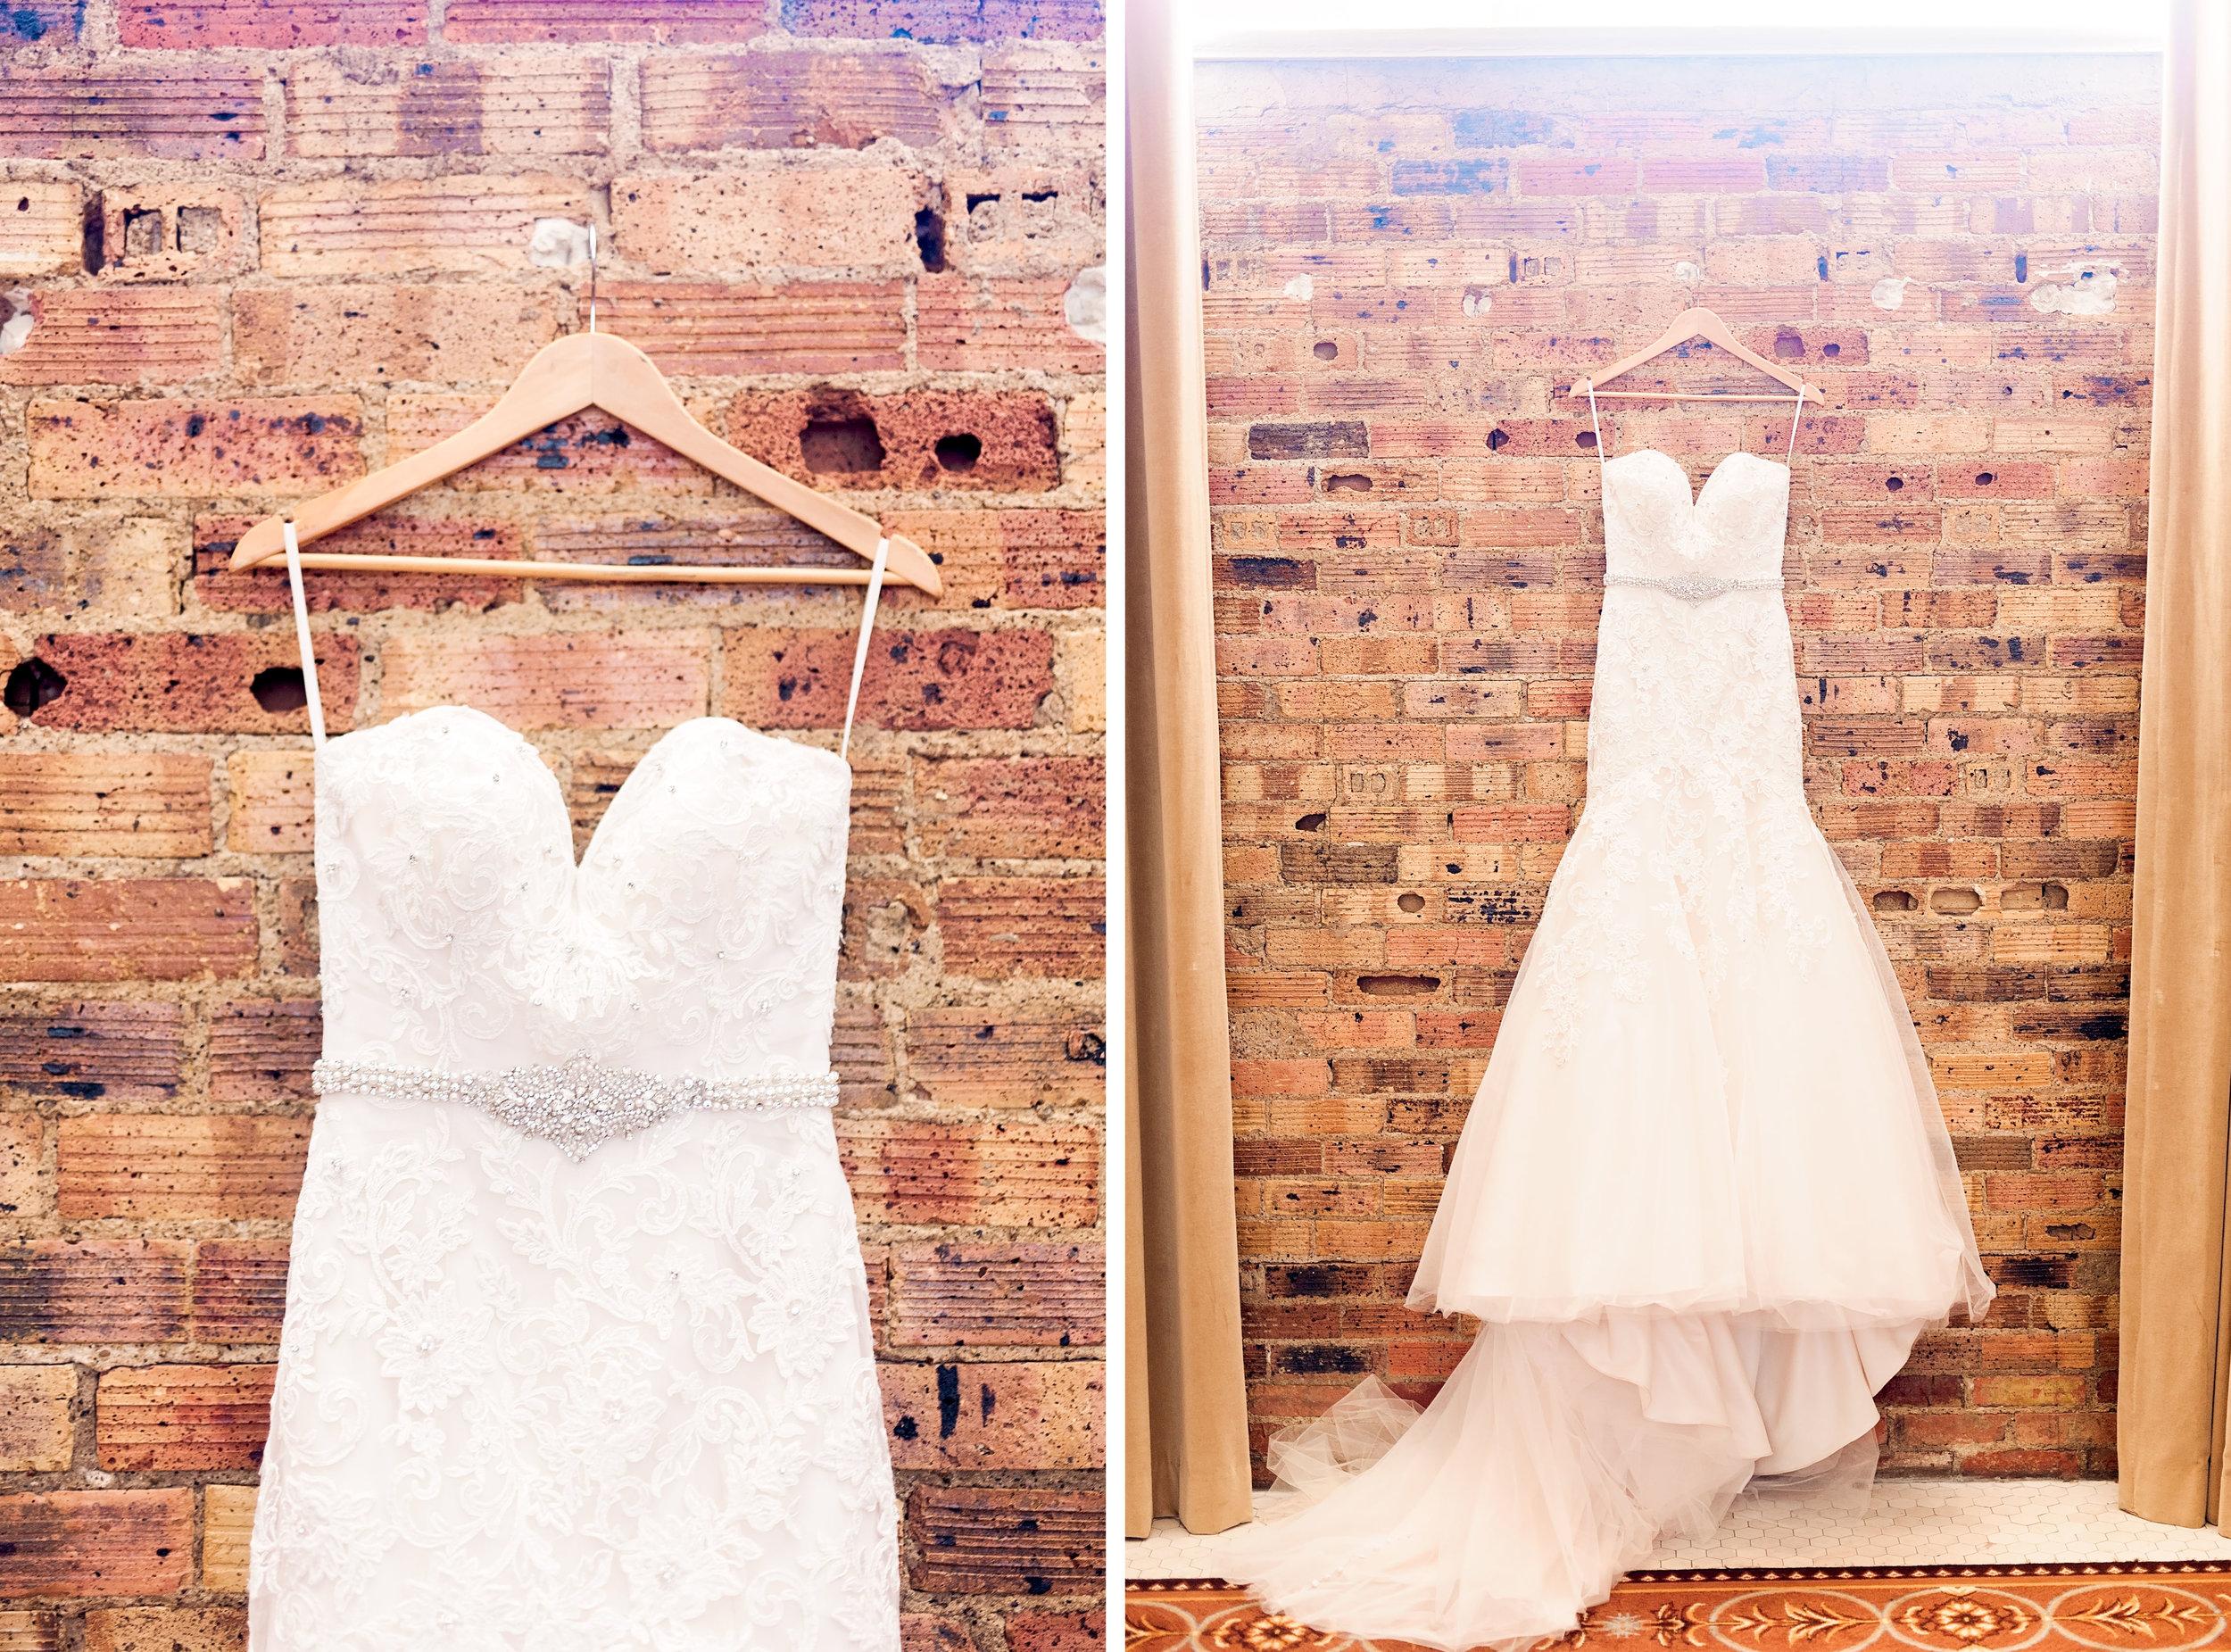 Dallas Wedding- Texas Photographer- Pharris Photography- Carrington and MaxxDallas Wedding- Texas Photographer- Pharris Photography- Carrington and Maxx- Wedding Dress